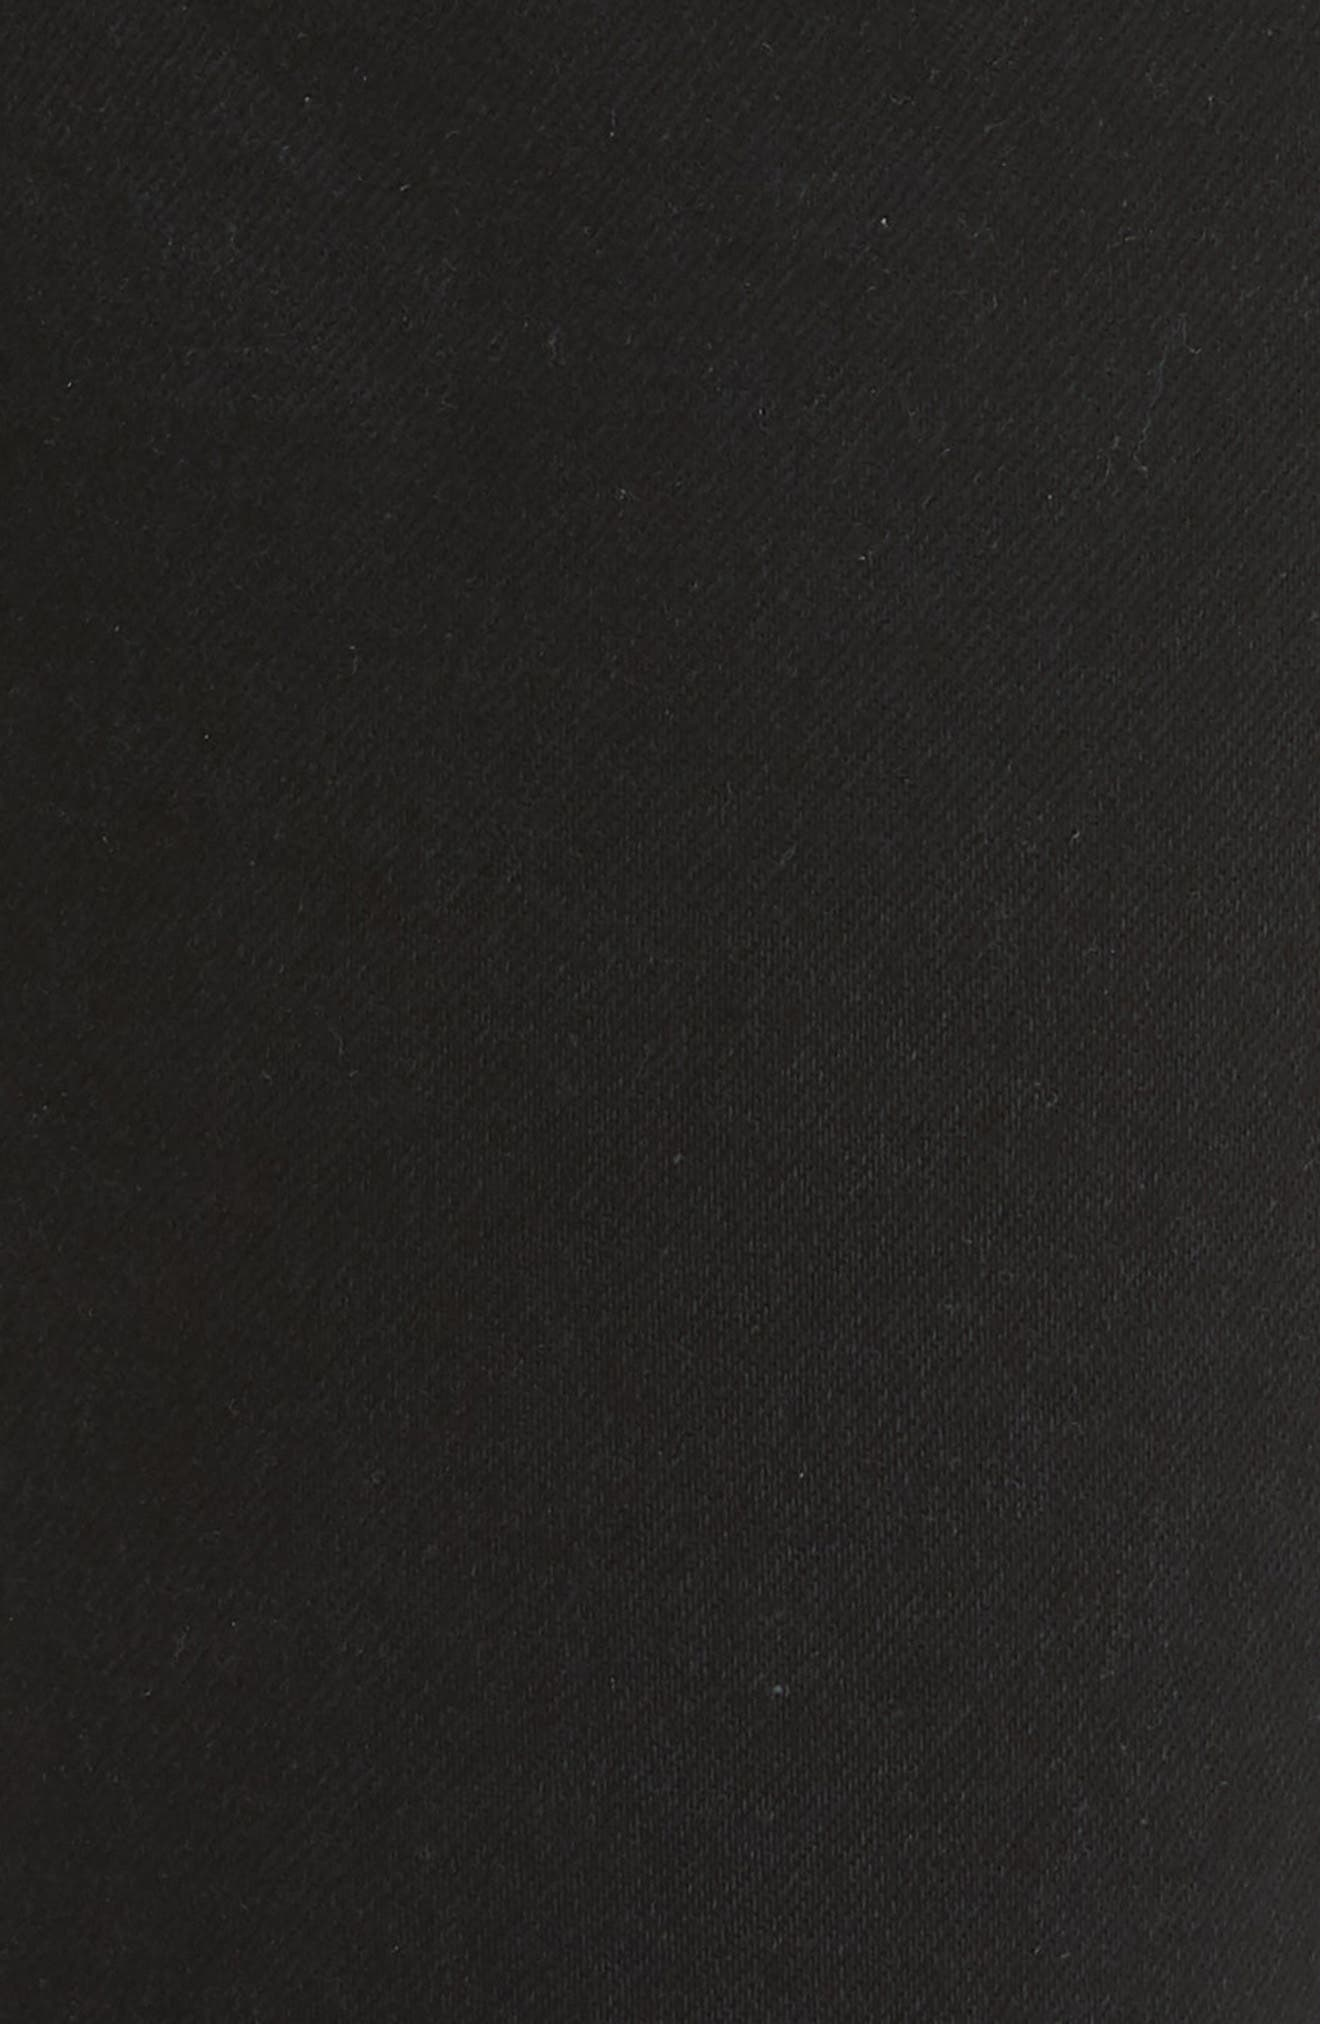 High Waist Ankle Jeans,                             Alternate thumbnail 6, color,                             Black Destroy